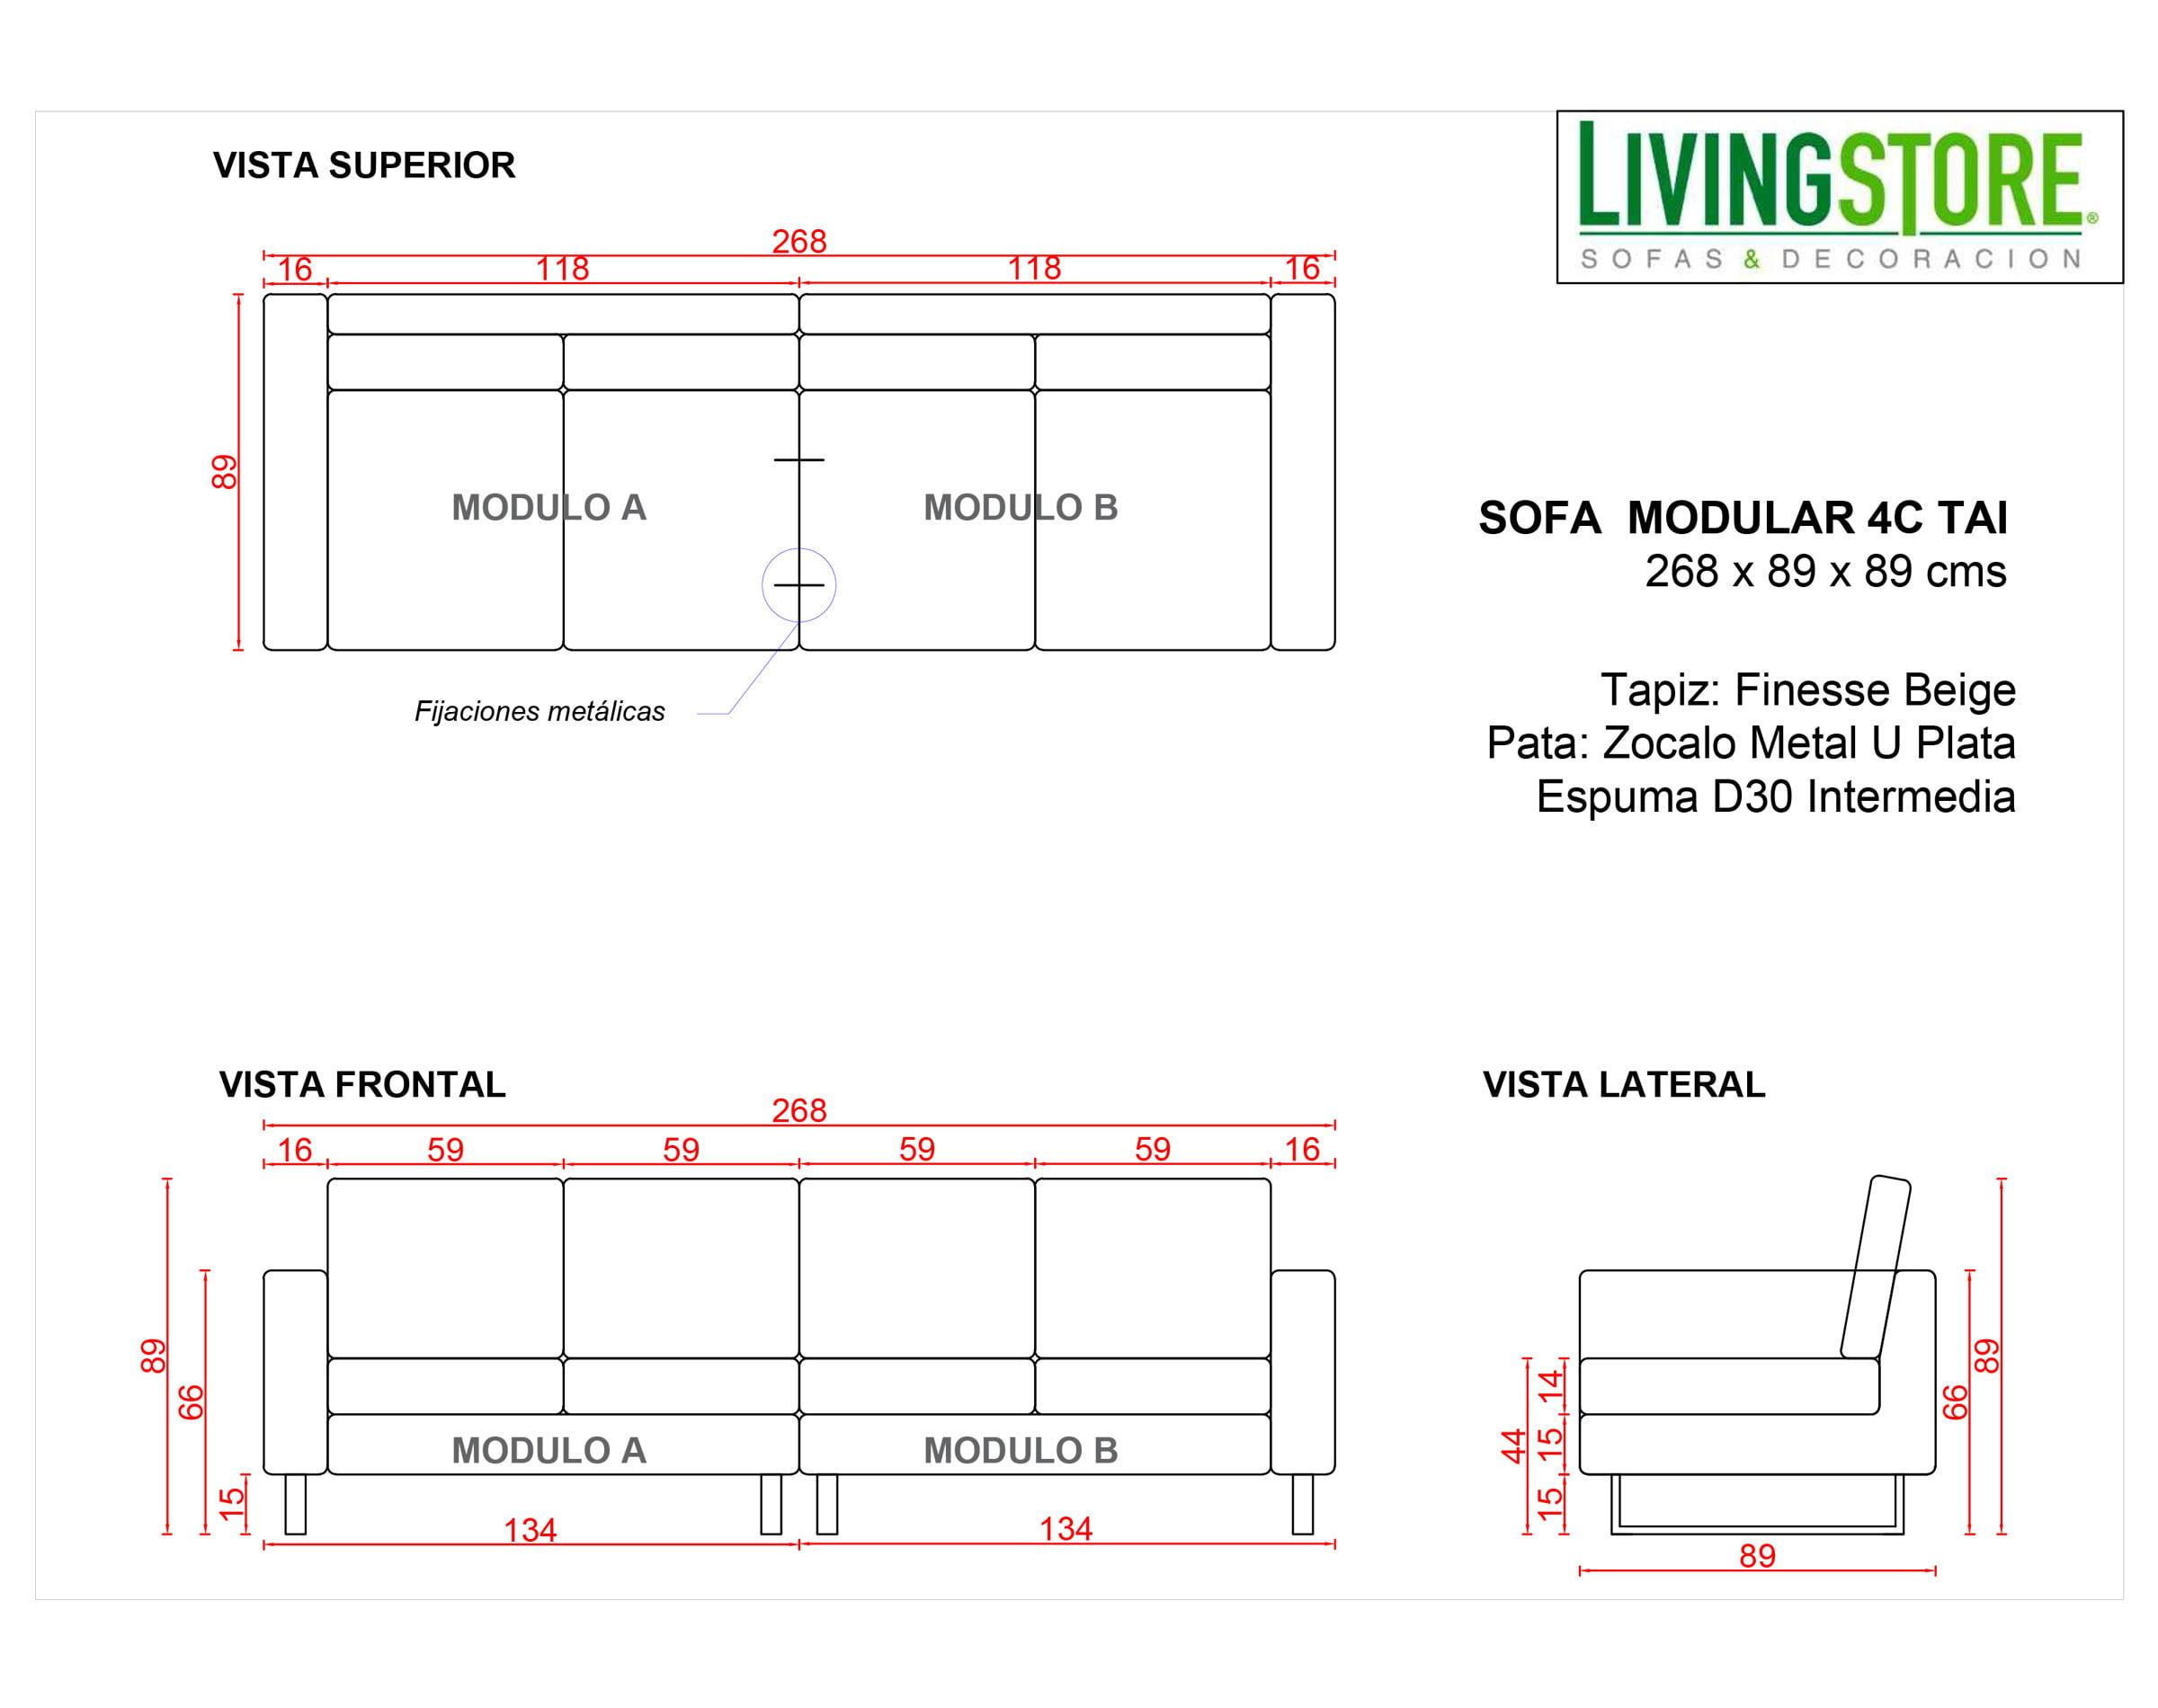 Planimetria Sofa 4c Tai Zocalo